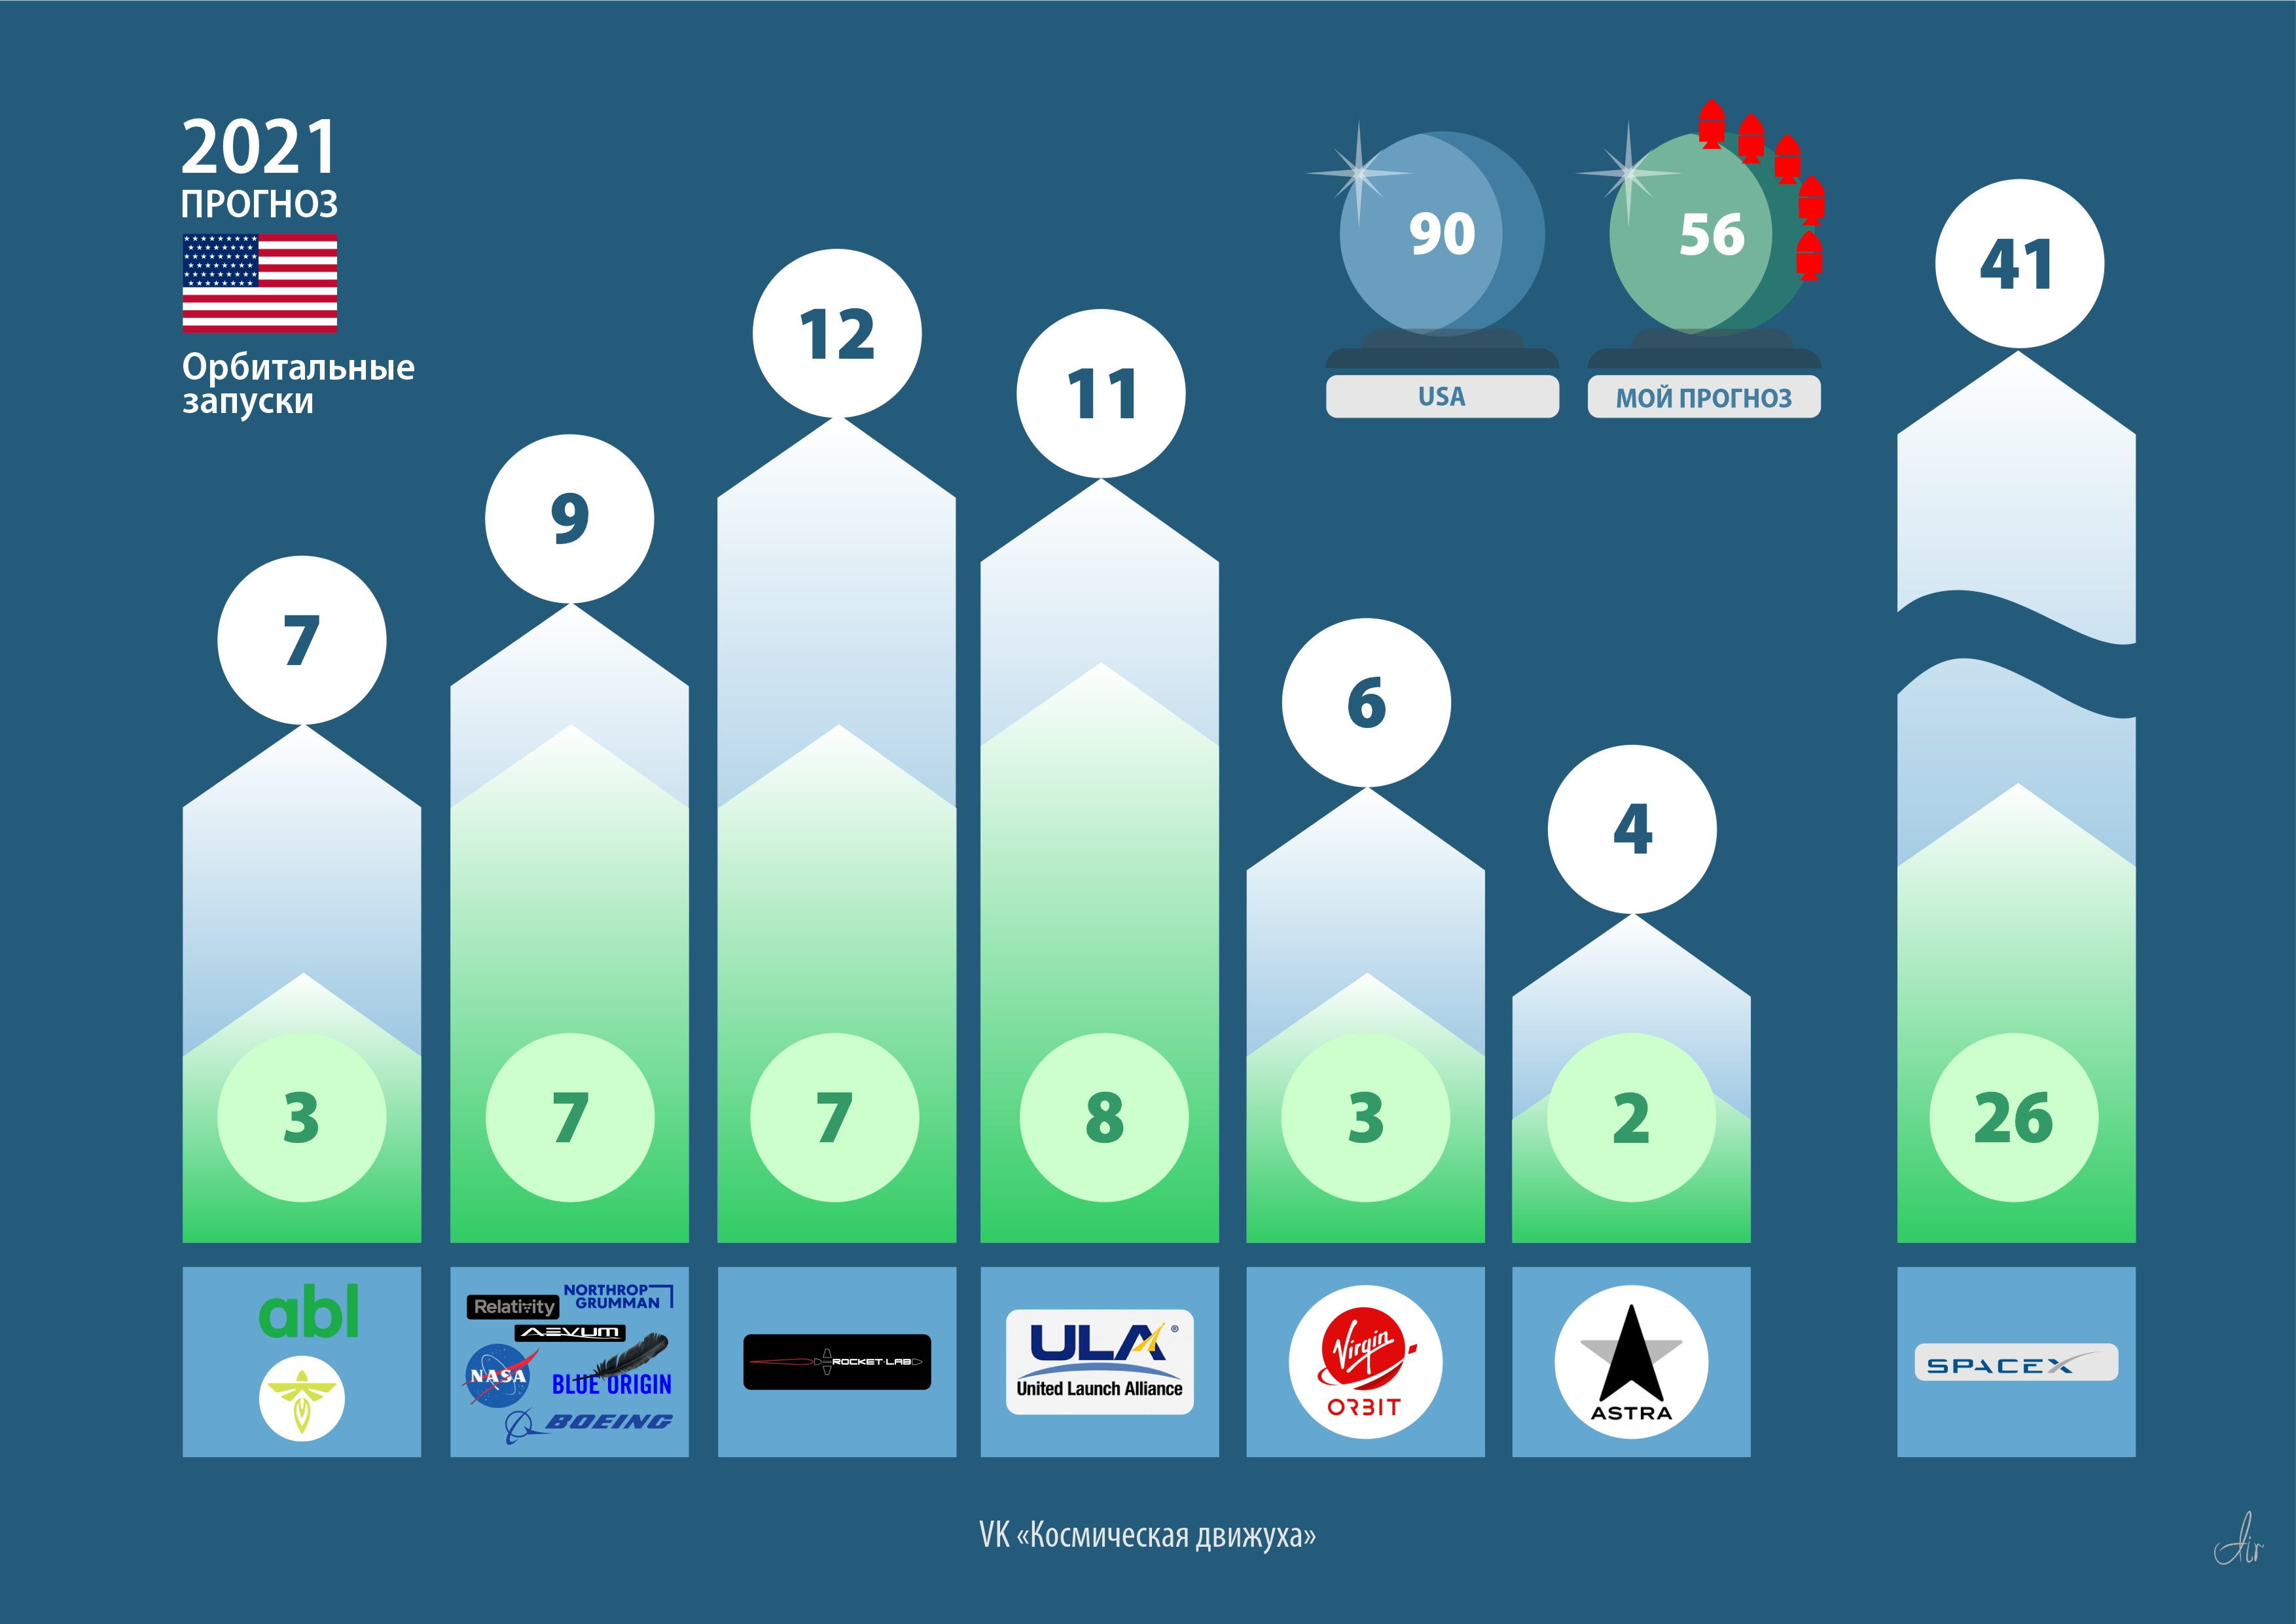 Ожидания и мой прогноз орбитальных запусков от США на 2021год. Методика зачета запусков по странам от Wiki «2021_in_spaceflight». В статистику включены запуски Rocket Lab.